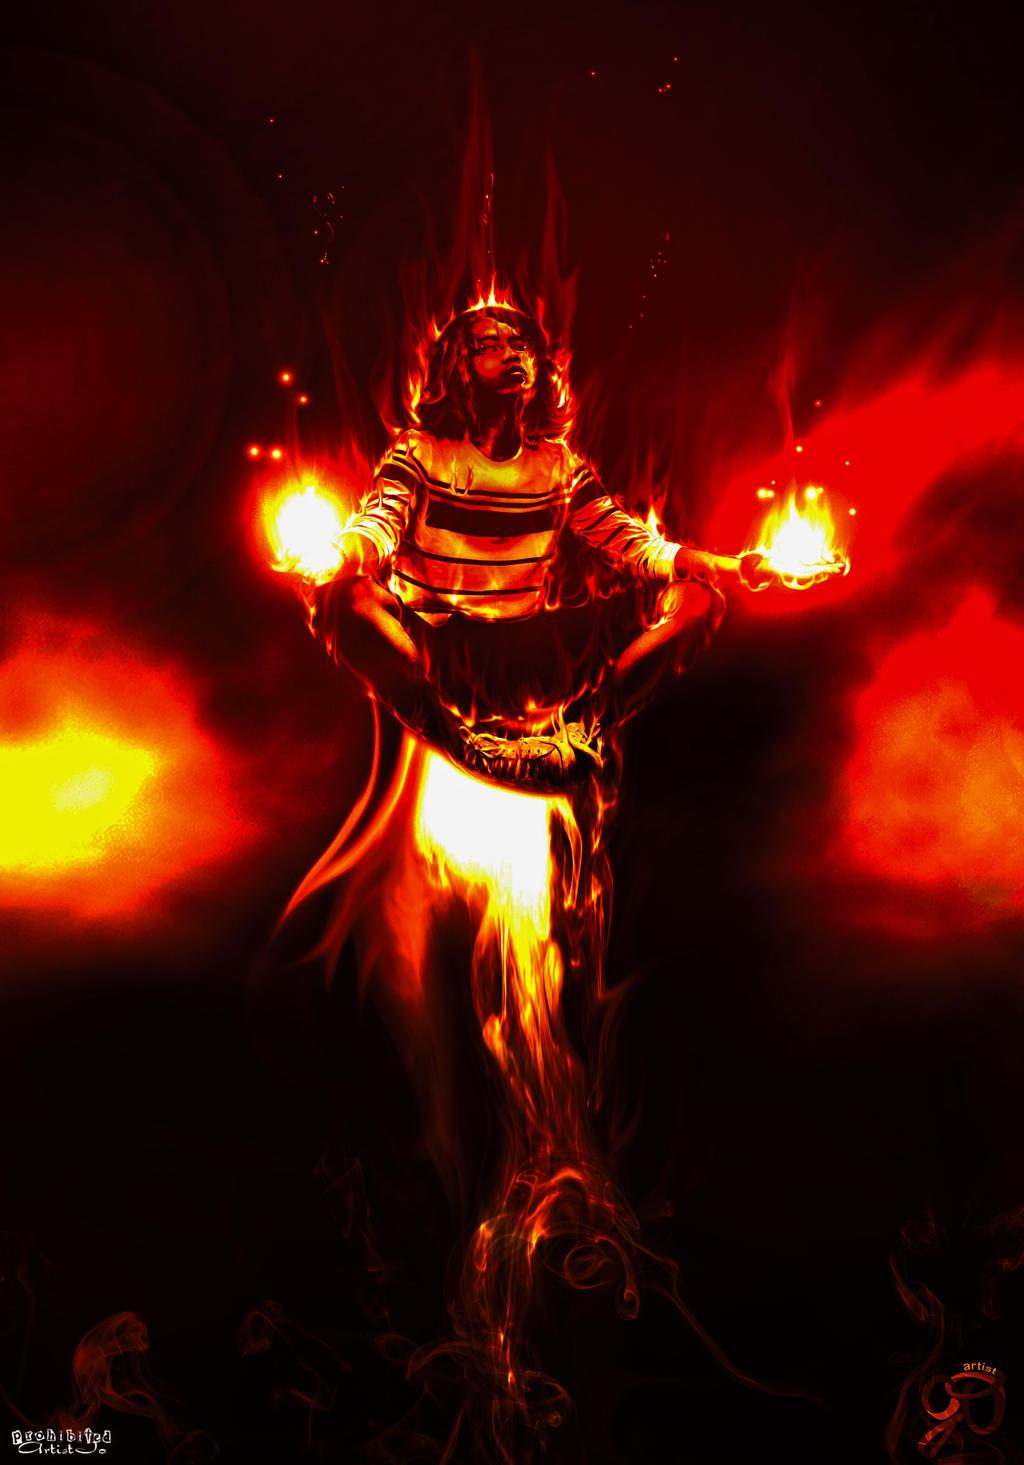 Burning Levitation